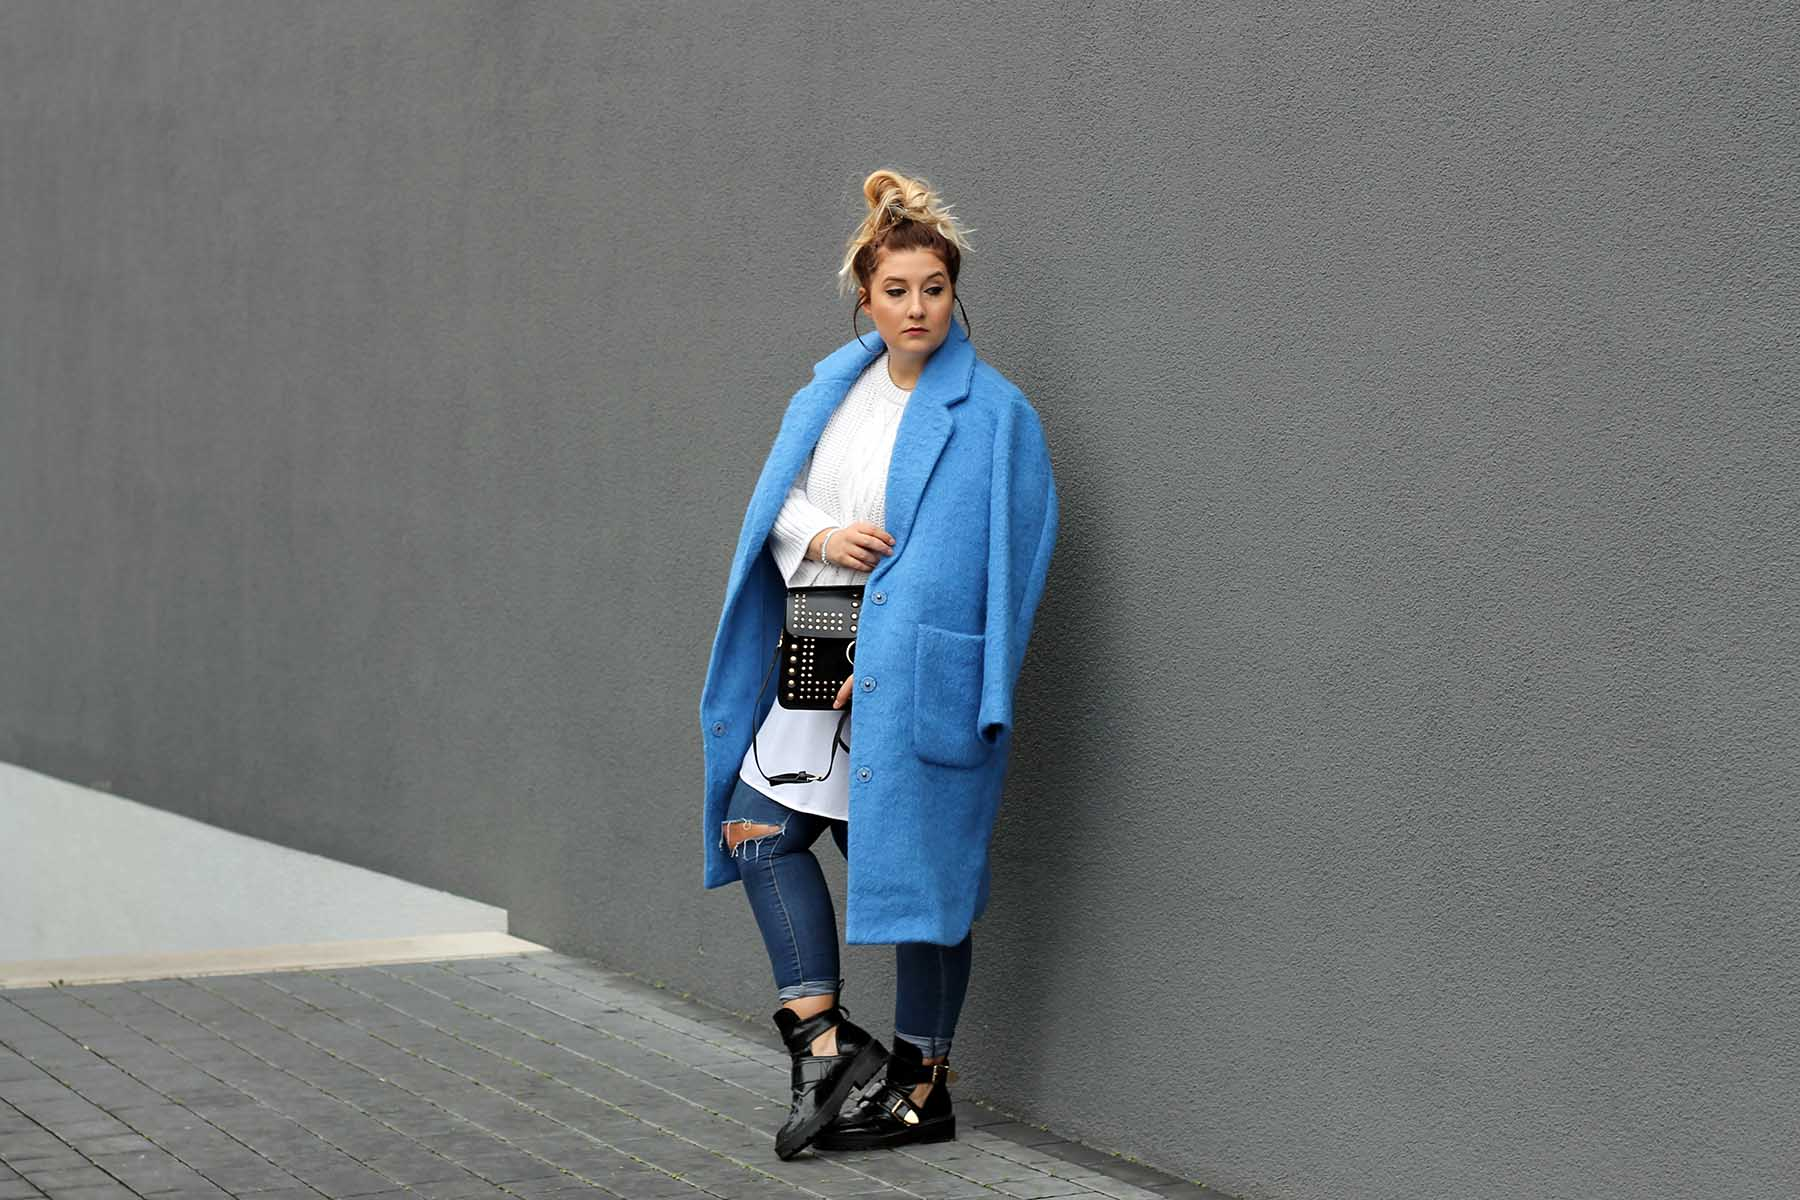 outfit-look-style-modeblog-fashionblog-blauer-mantel-jeans-balenciaga-lookalike-boots-chloe6